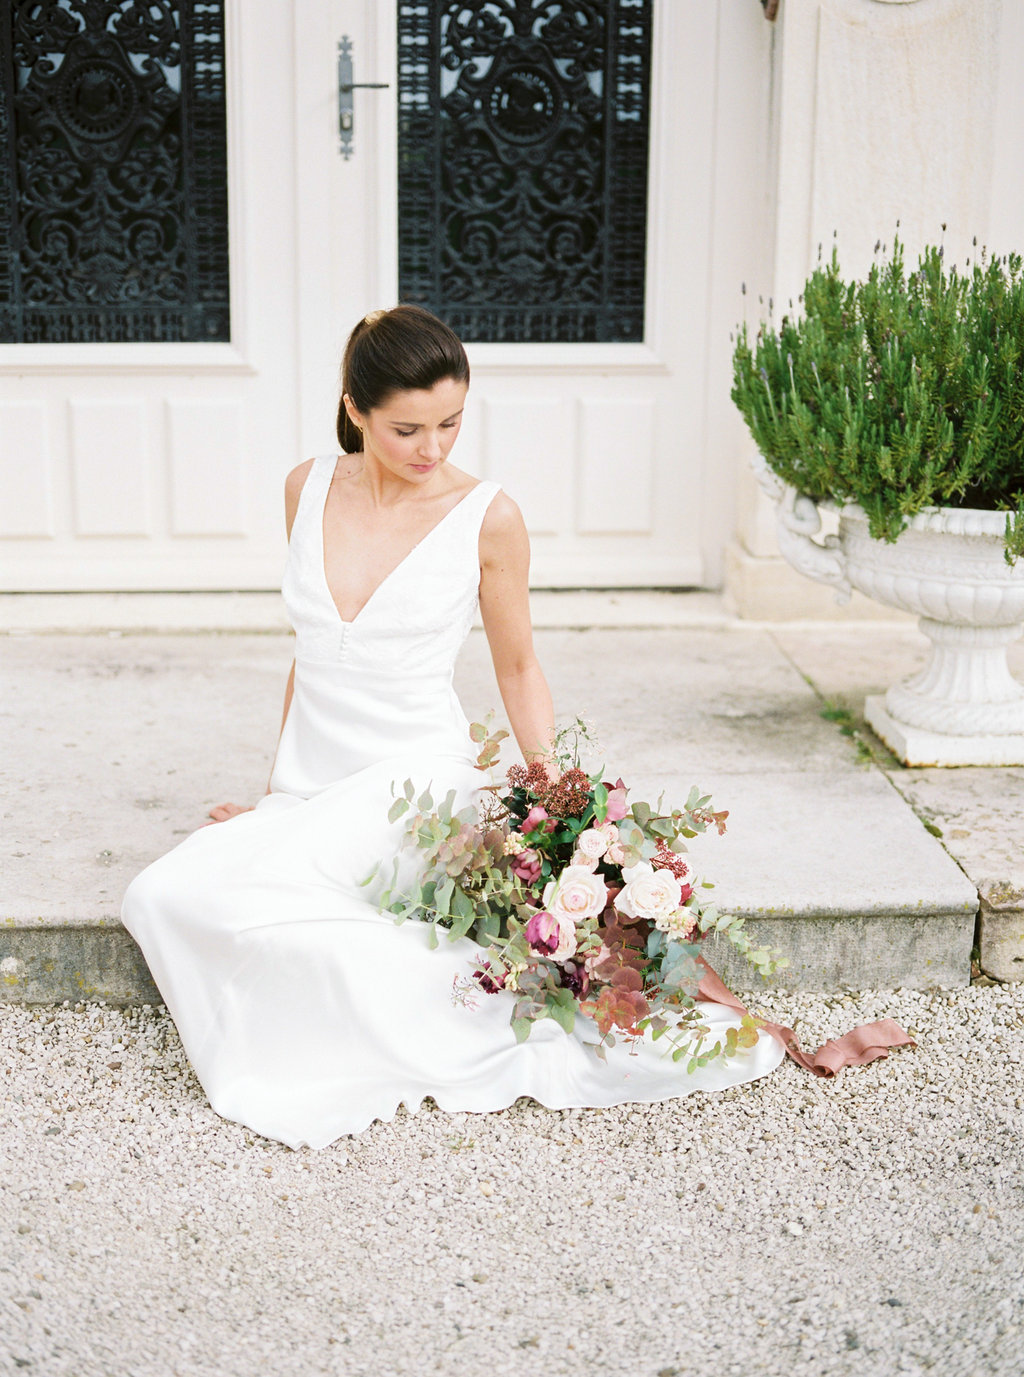 Bride with wedding bouquet wearing Charlie Brear dress